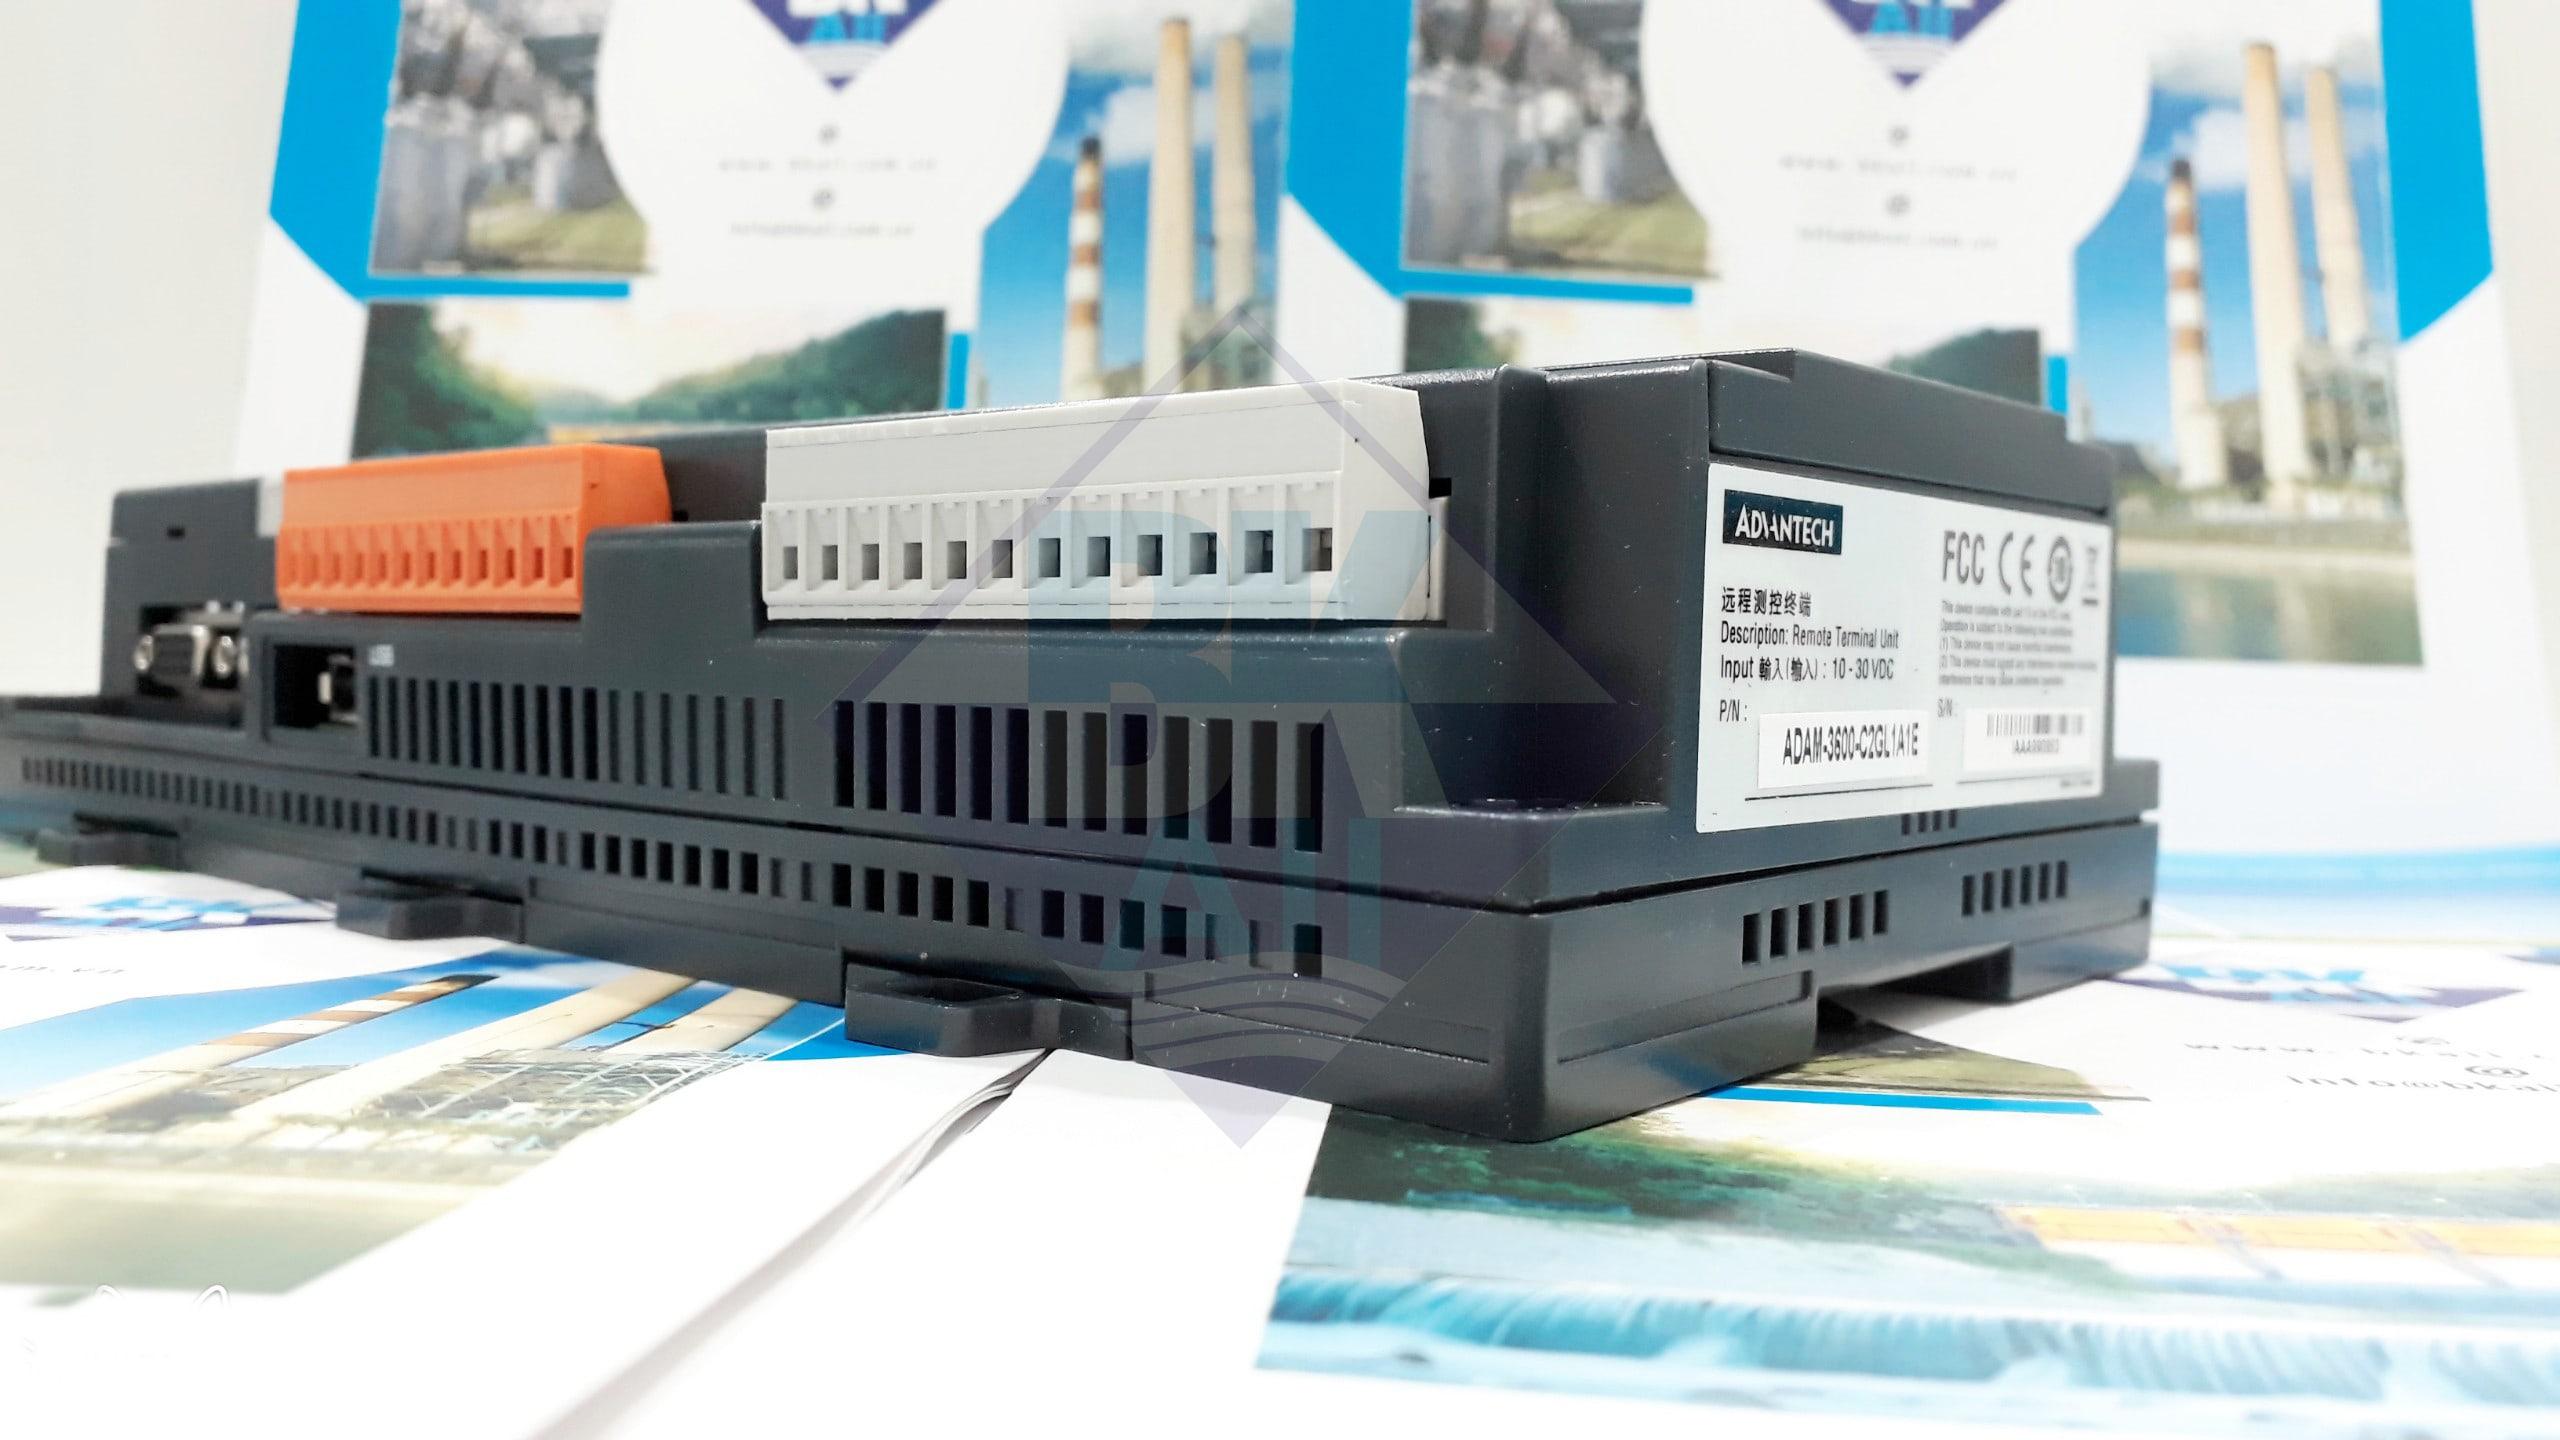 ADAM-3600: 8AI/8DI/4DO/ 4-Slot Expansion Wireless Intelligent RTU